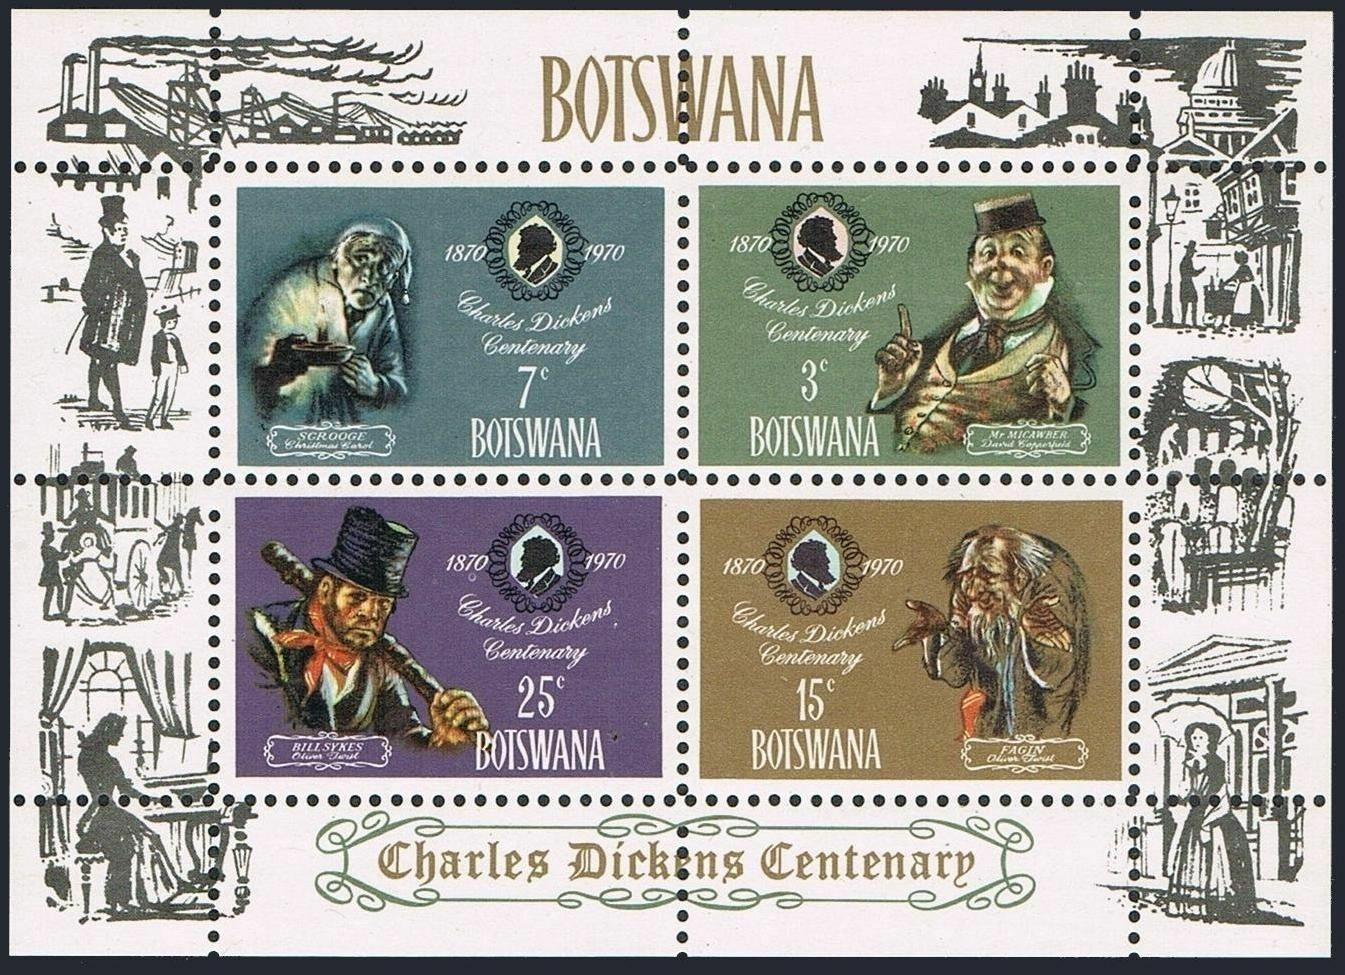 Botswana - Scott #65a (1970)